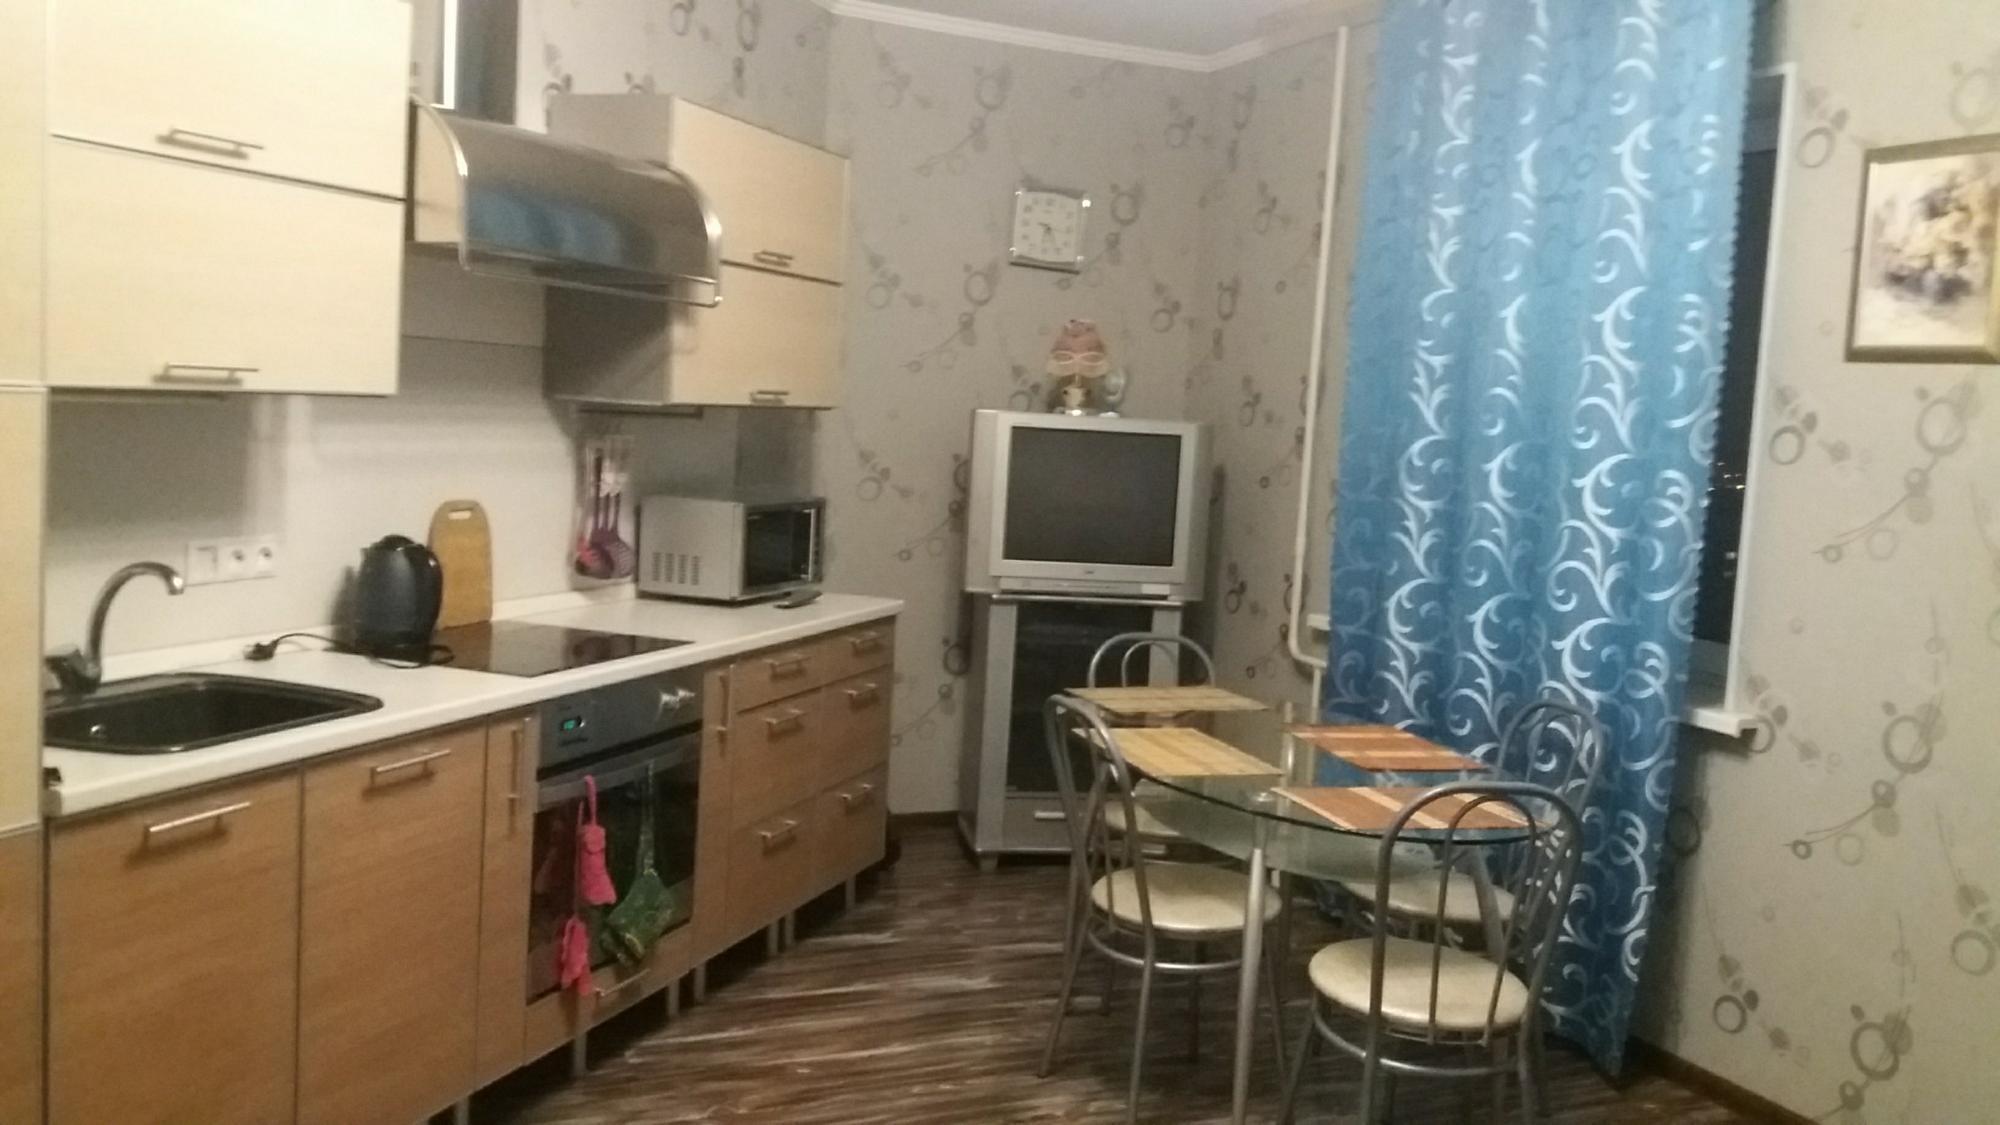 Квартира, 1 комната, 42 м² в Домодедово 89057005352 купить 5